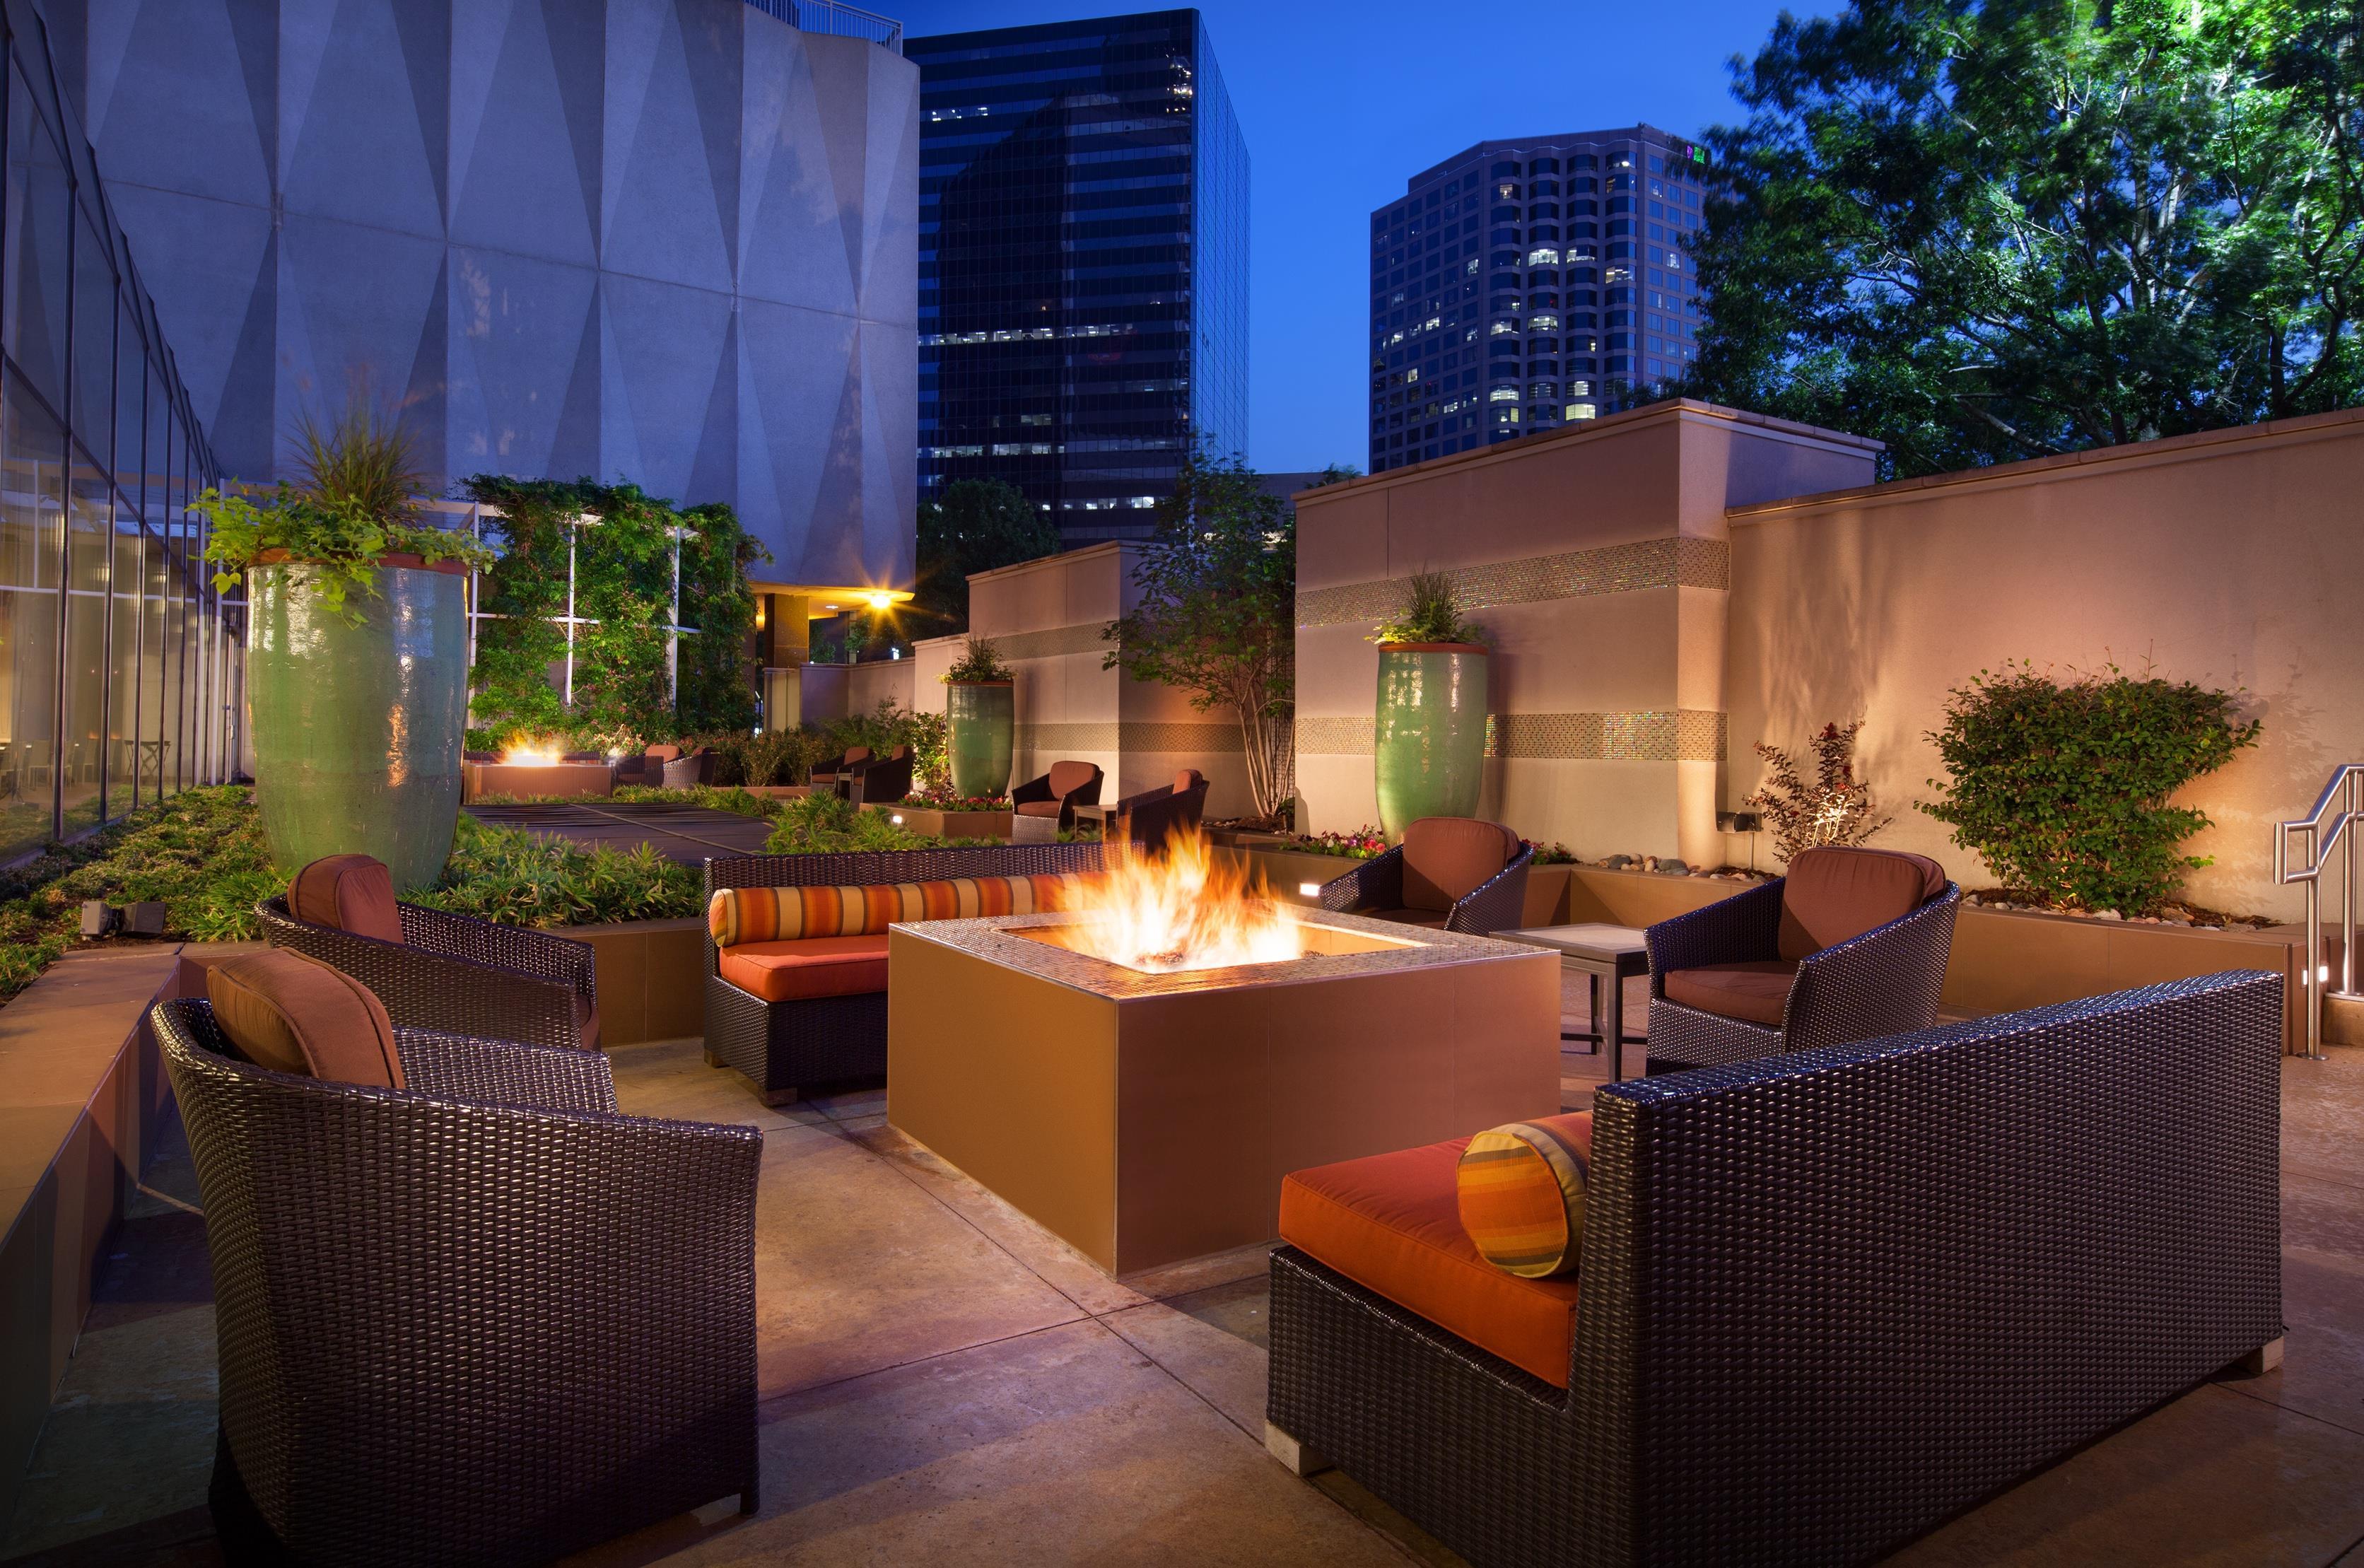 Sheraton dallas hotel at 400 north olive street dallas tx on fave for 400 garden city plaza